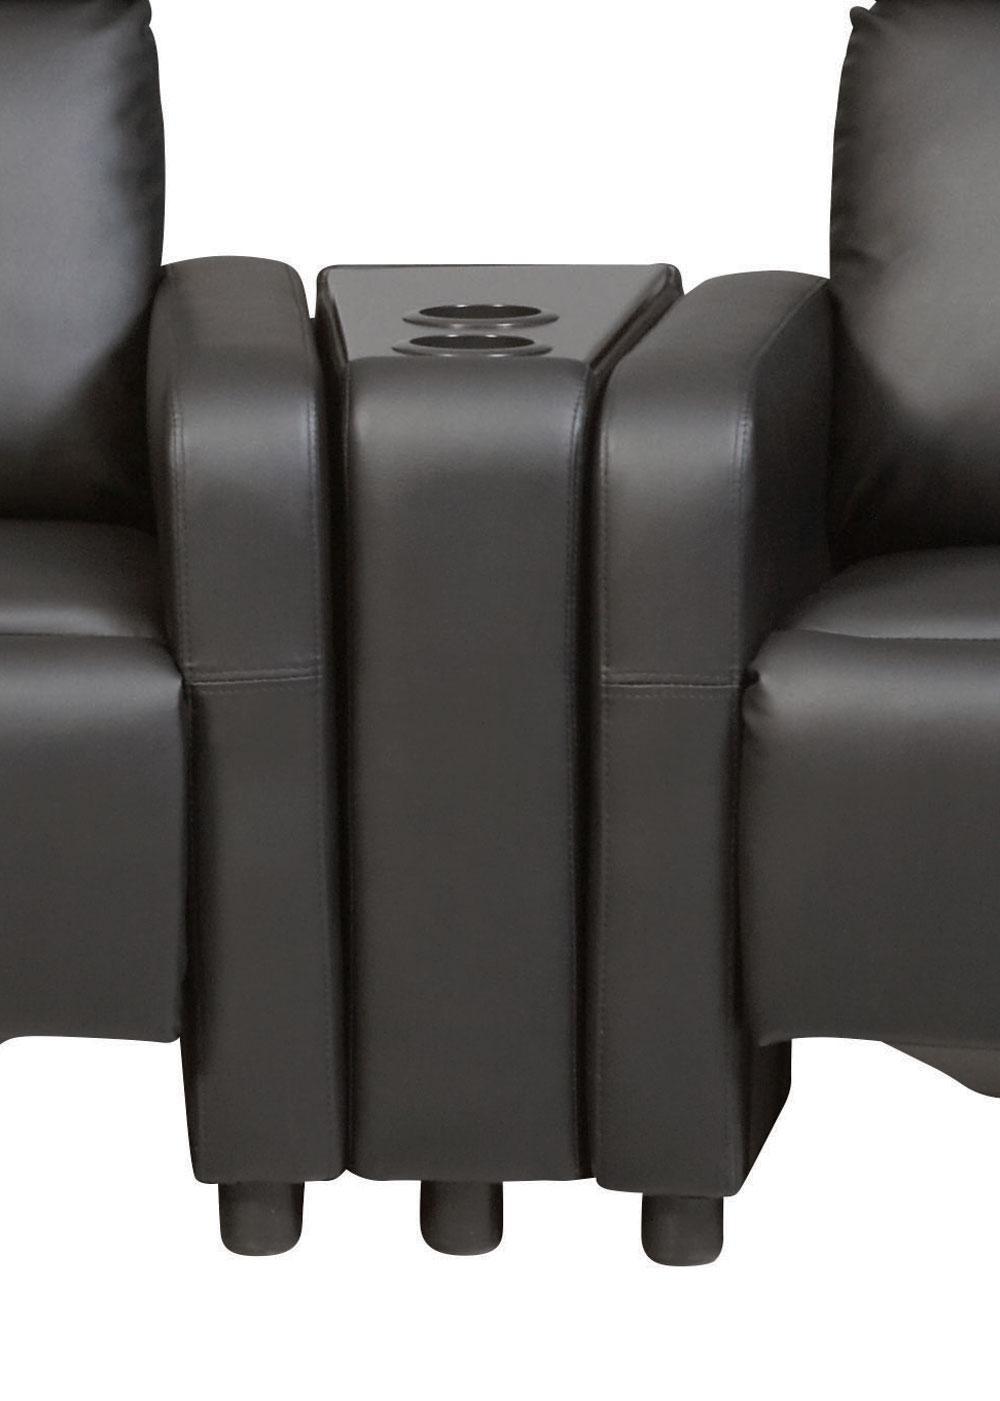 Allie Sofa | Passport Furnishings Within Allie Dark Grey Sofa Chairs (View 21 of 25)